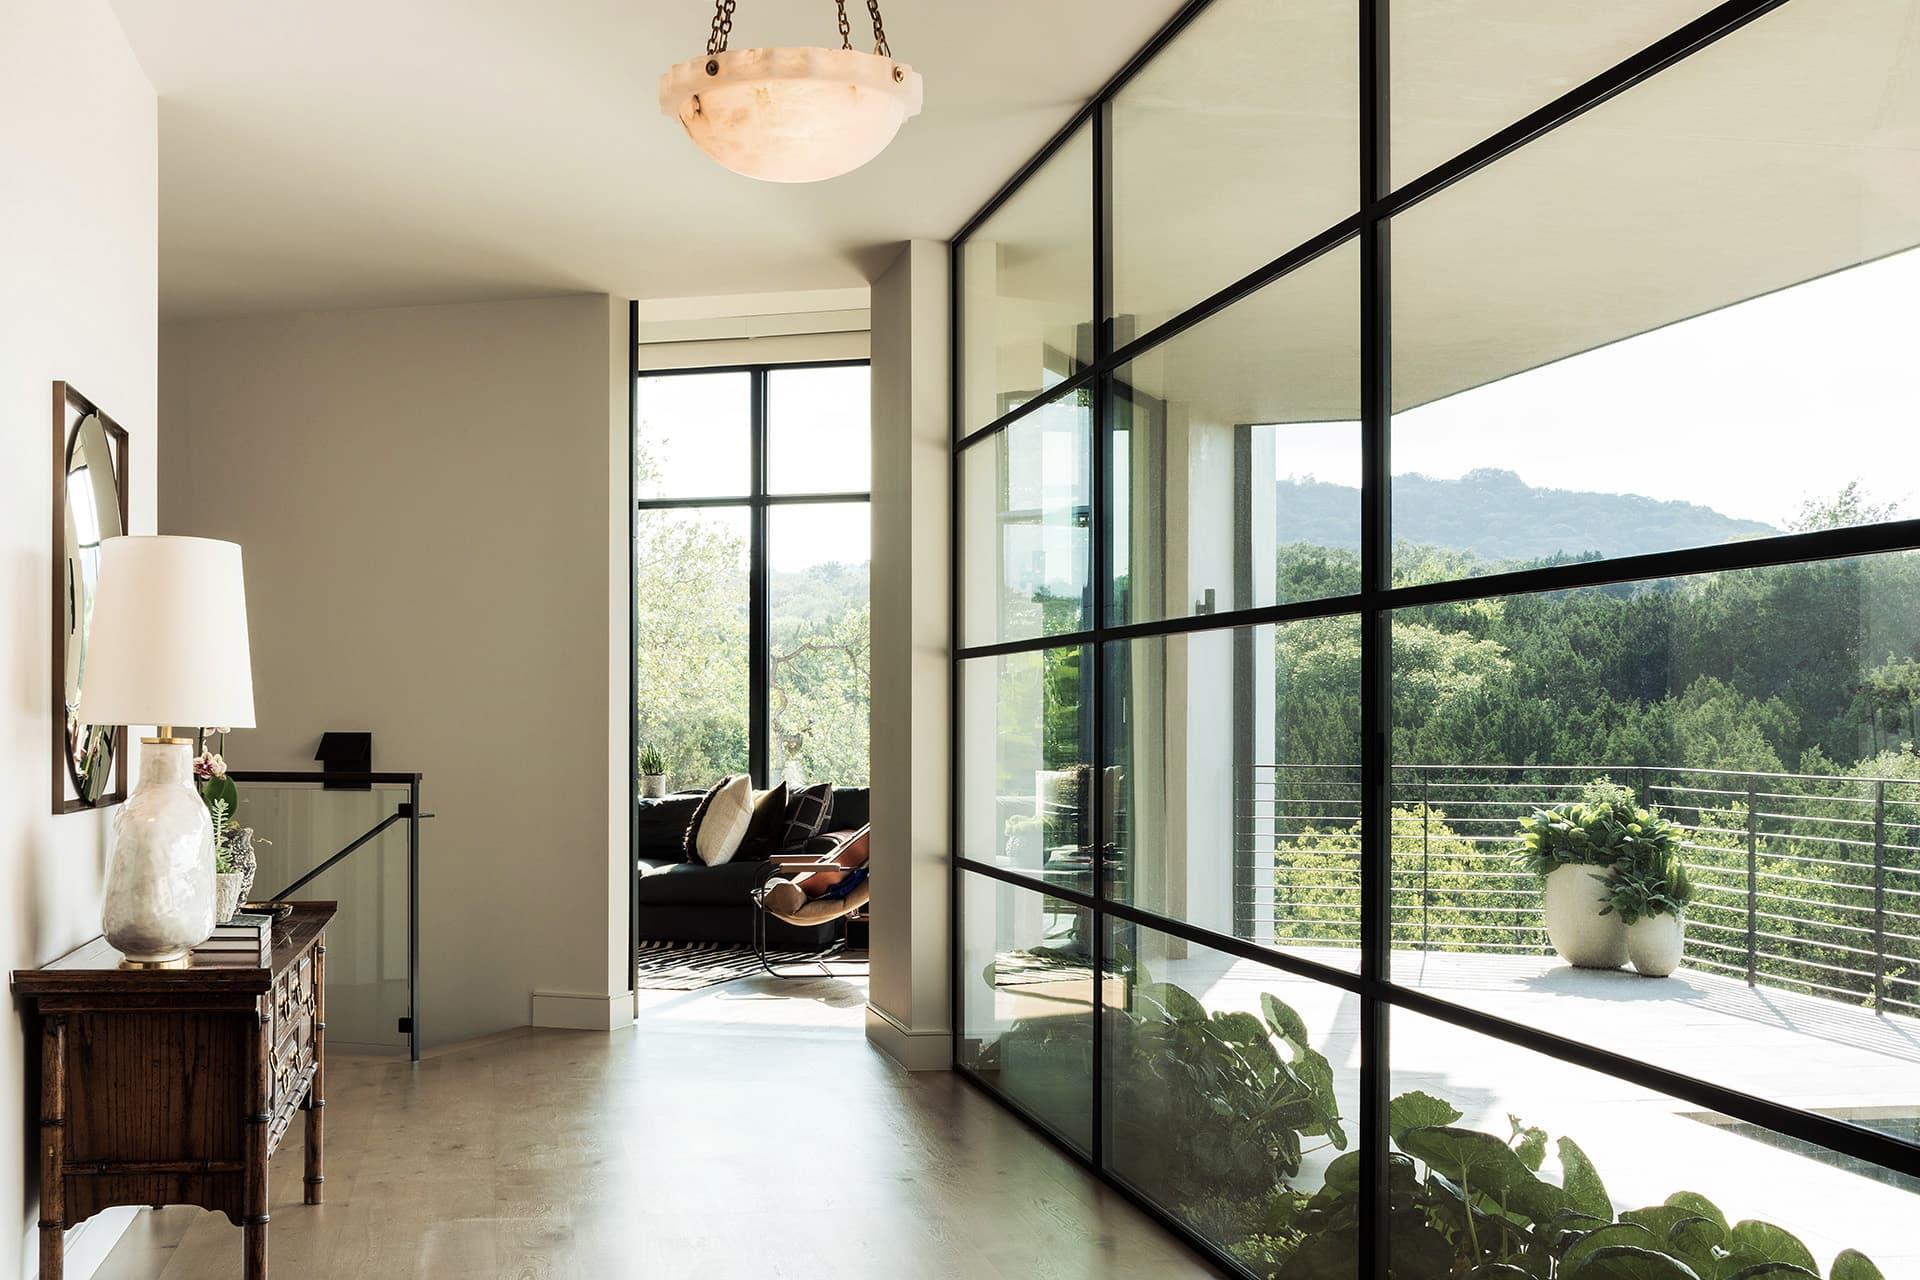 westview-cliffside-mccollum-studio-architects-16